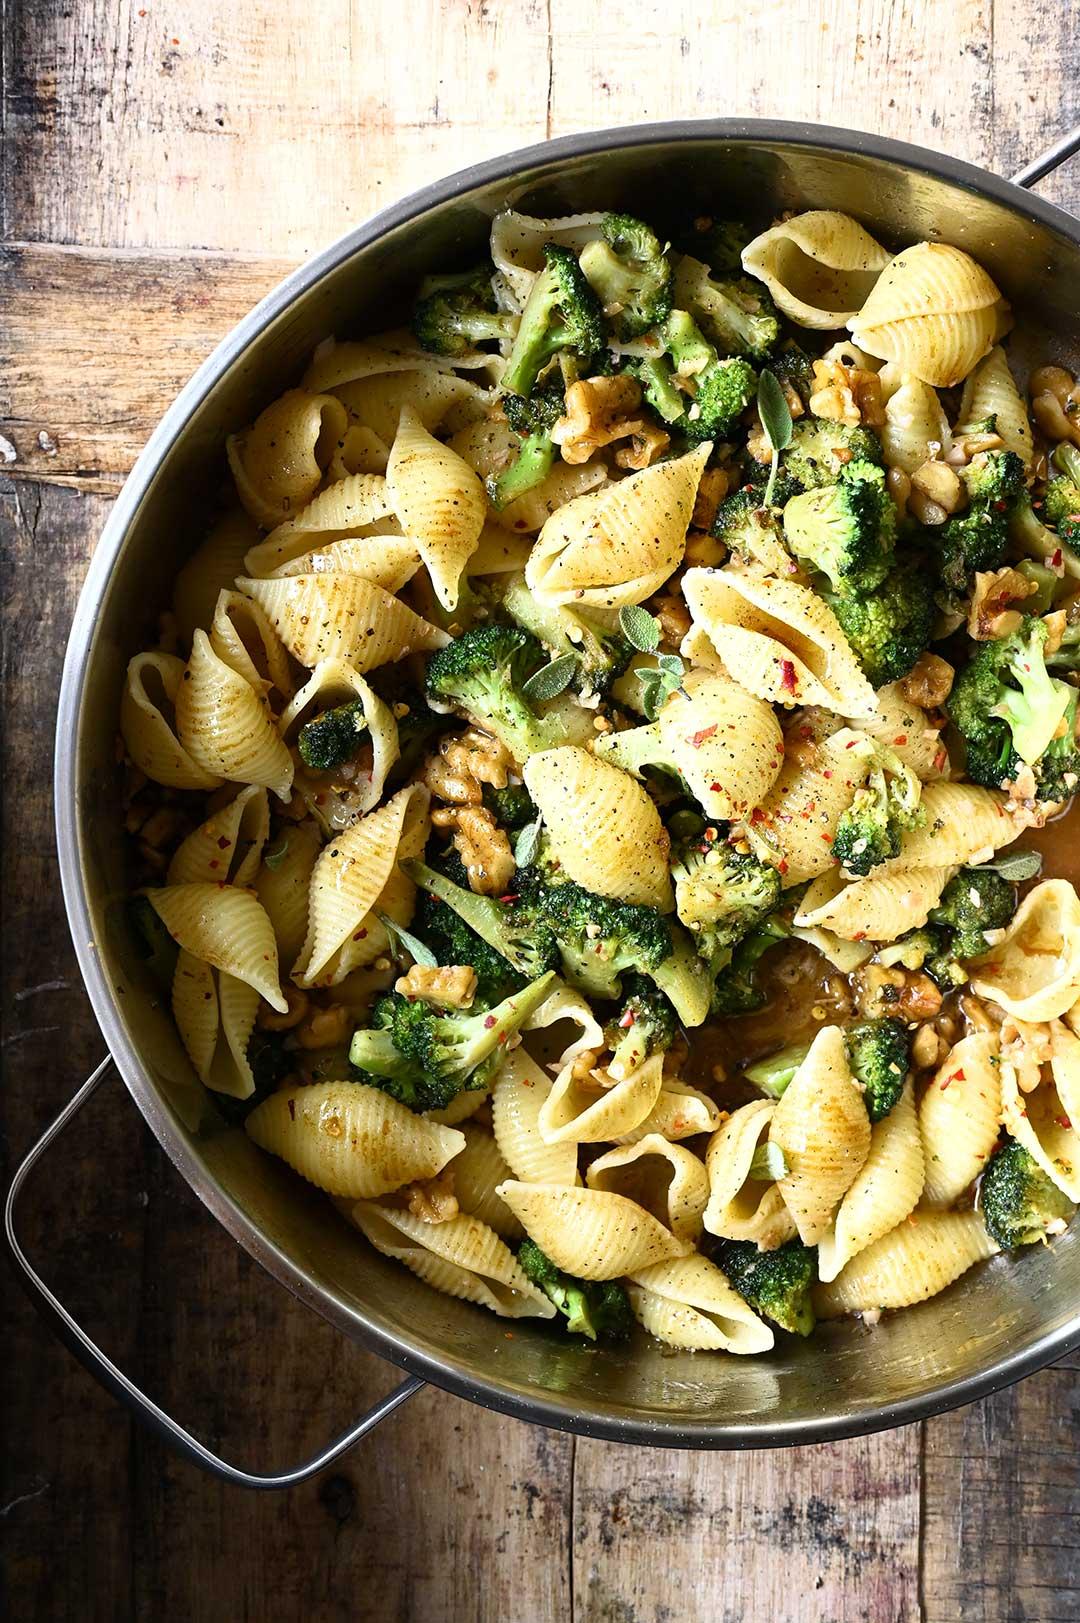 serving dumplings | Brown Butter Broccoli and Walnut Pasta